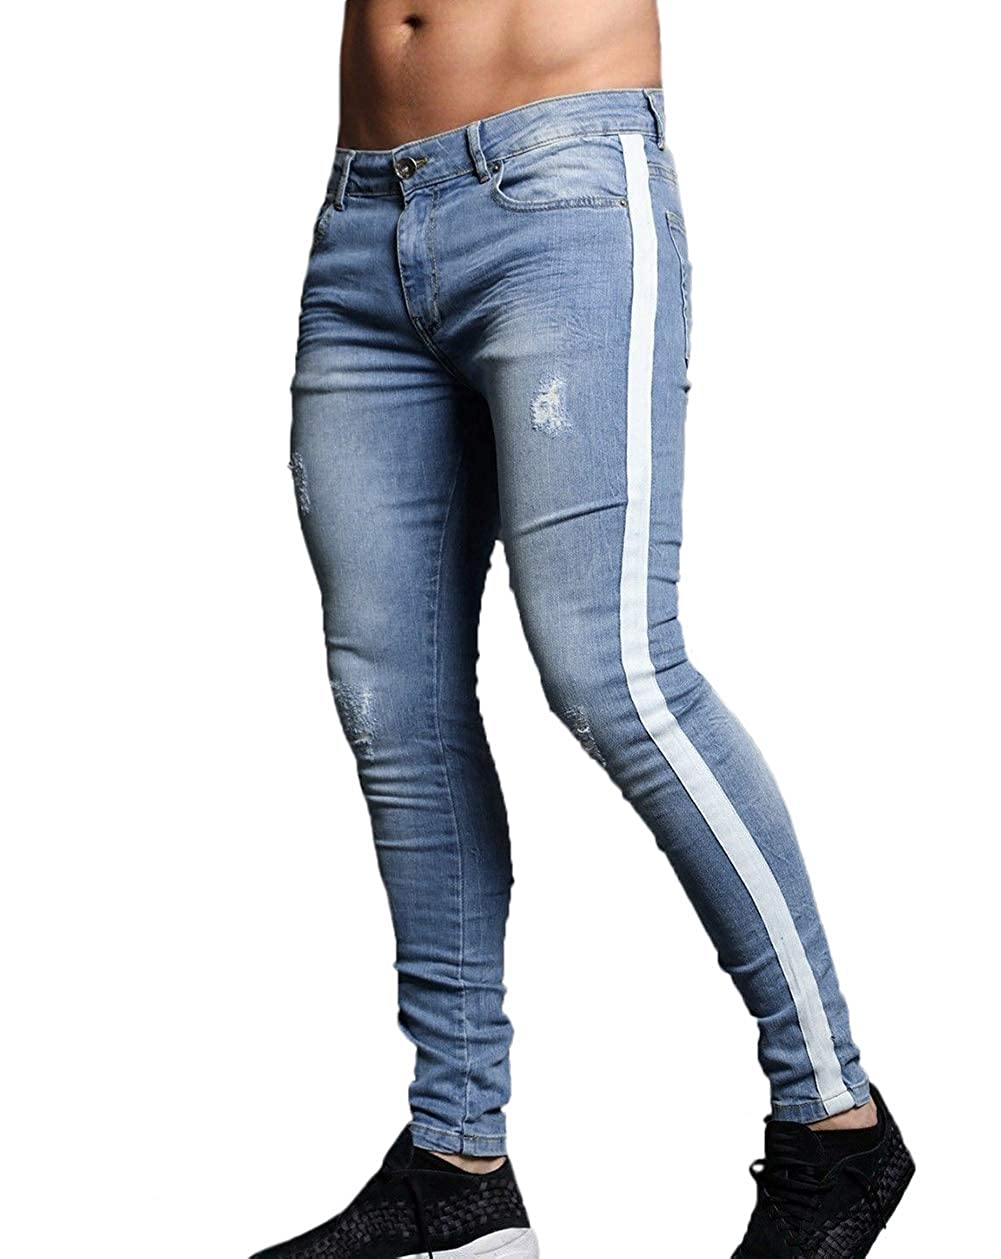 91625d25272f39 XARAZA Men's Skinny Slim Fit Stretch Jeans Denim Pencil Pants at Amazon  Men's Clothing store: